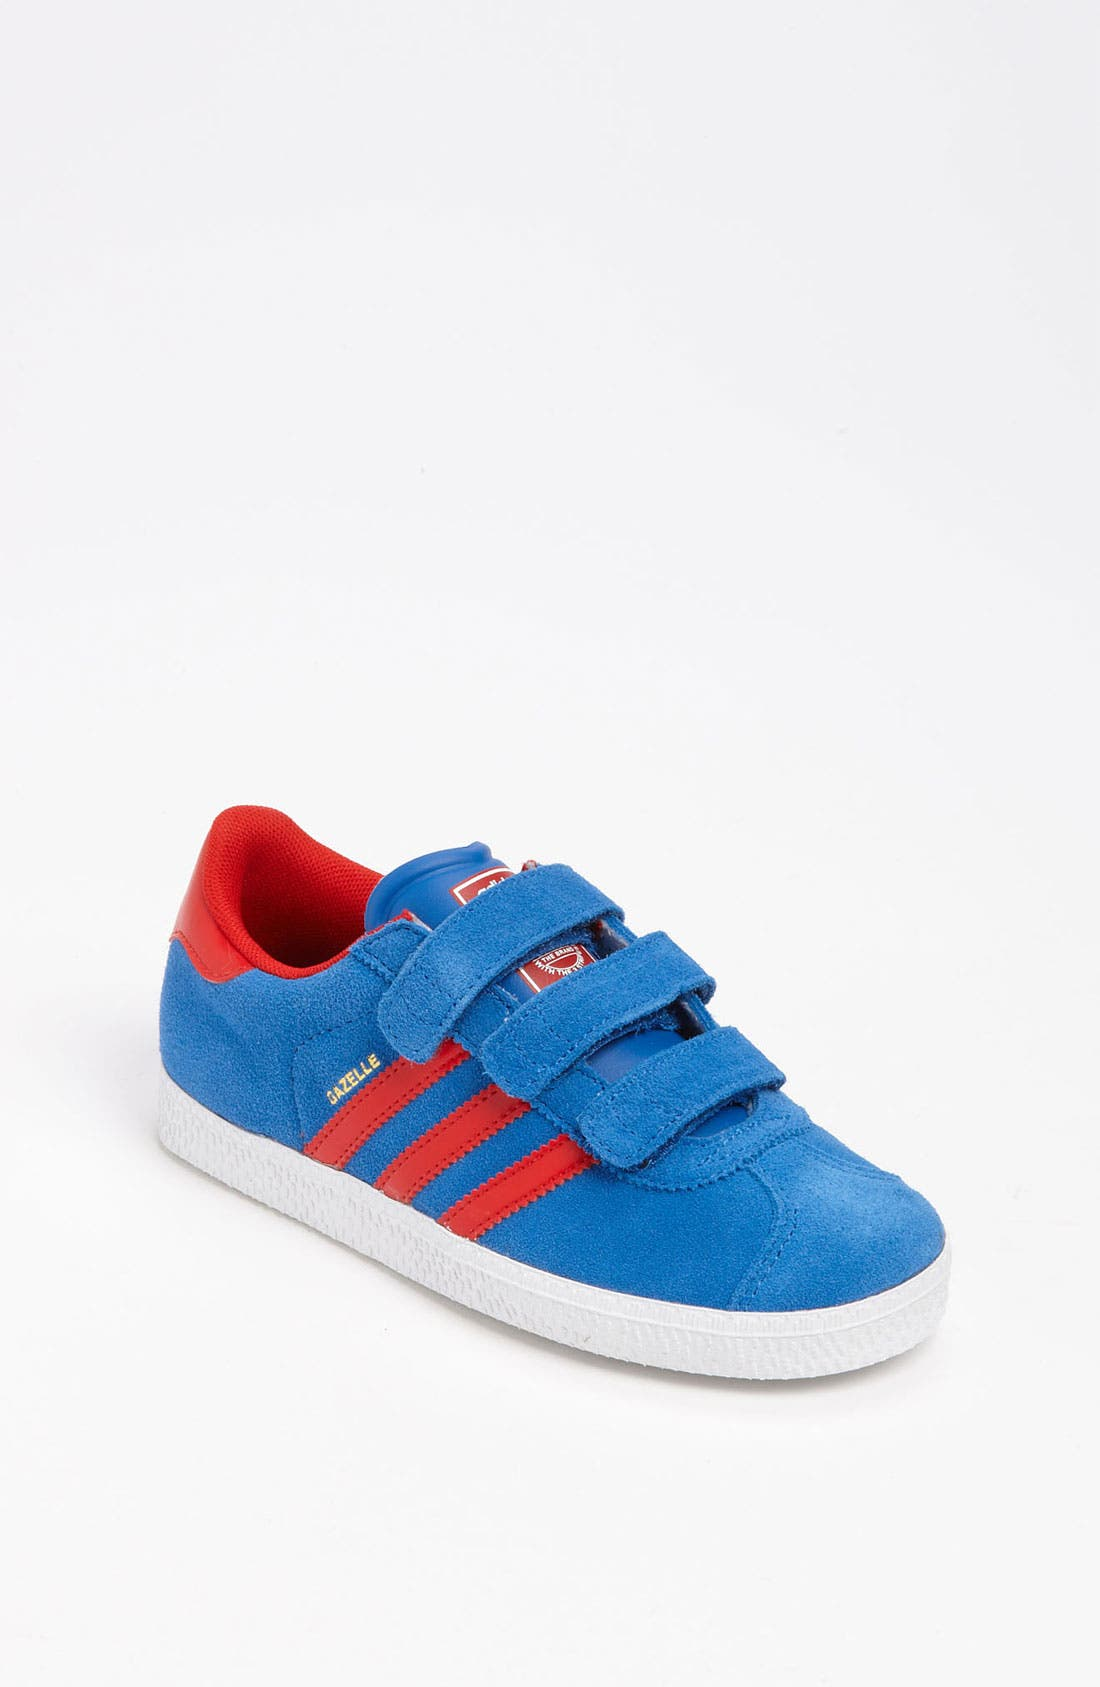 Main Image - adidas 'Gazelle 2' Sneaker (Toddler & Little Kid)